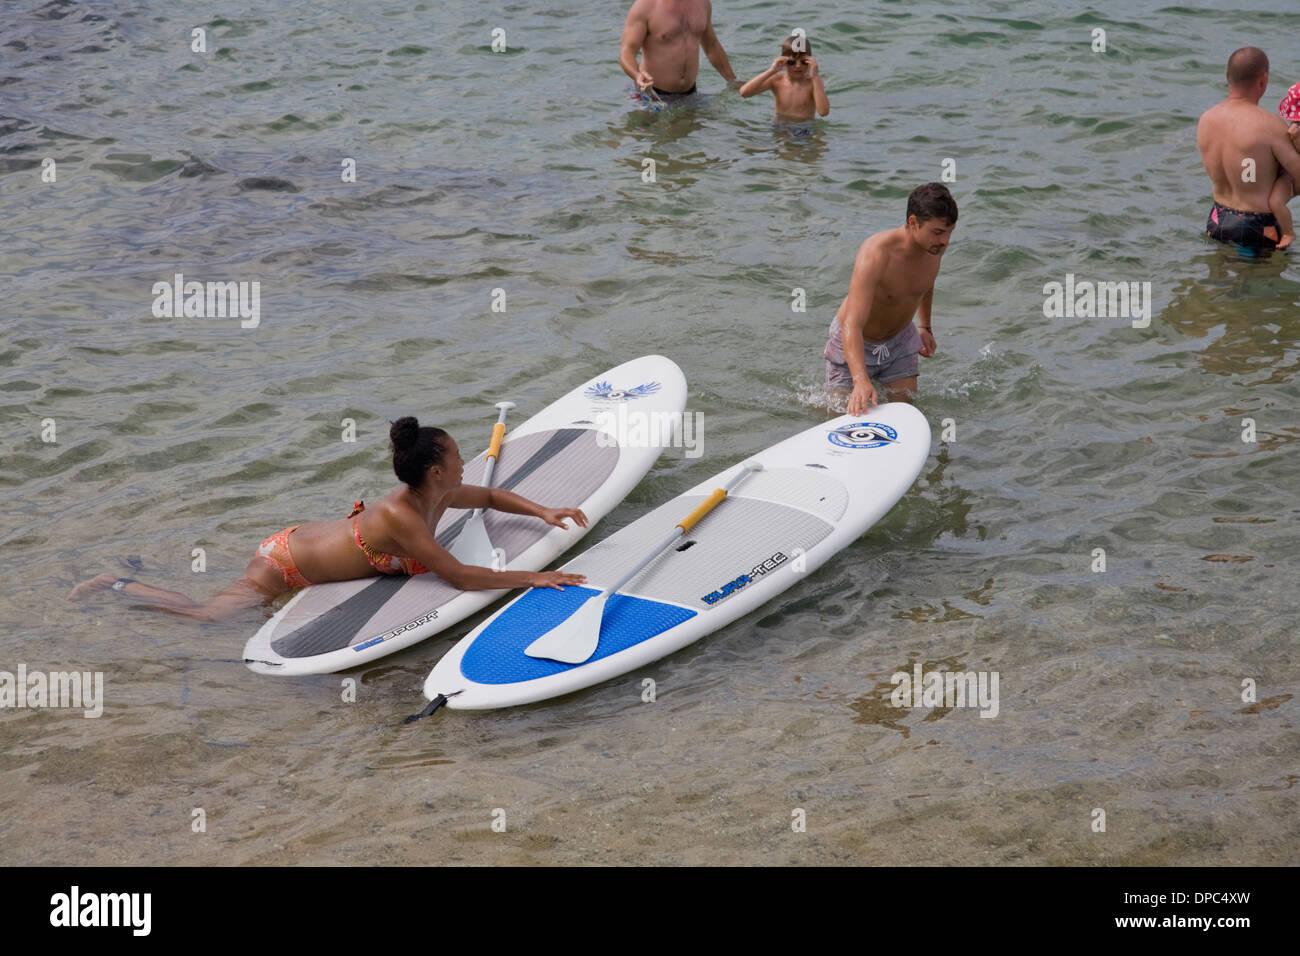 Imparare a paddleboard Immagini Stock